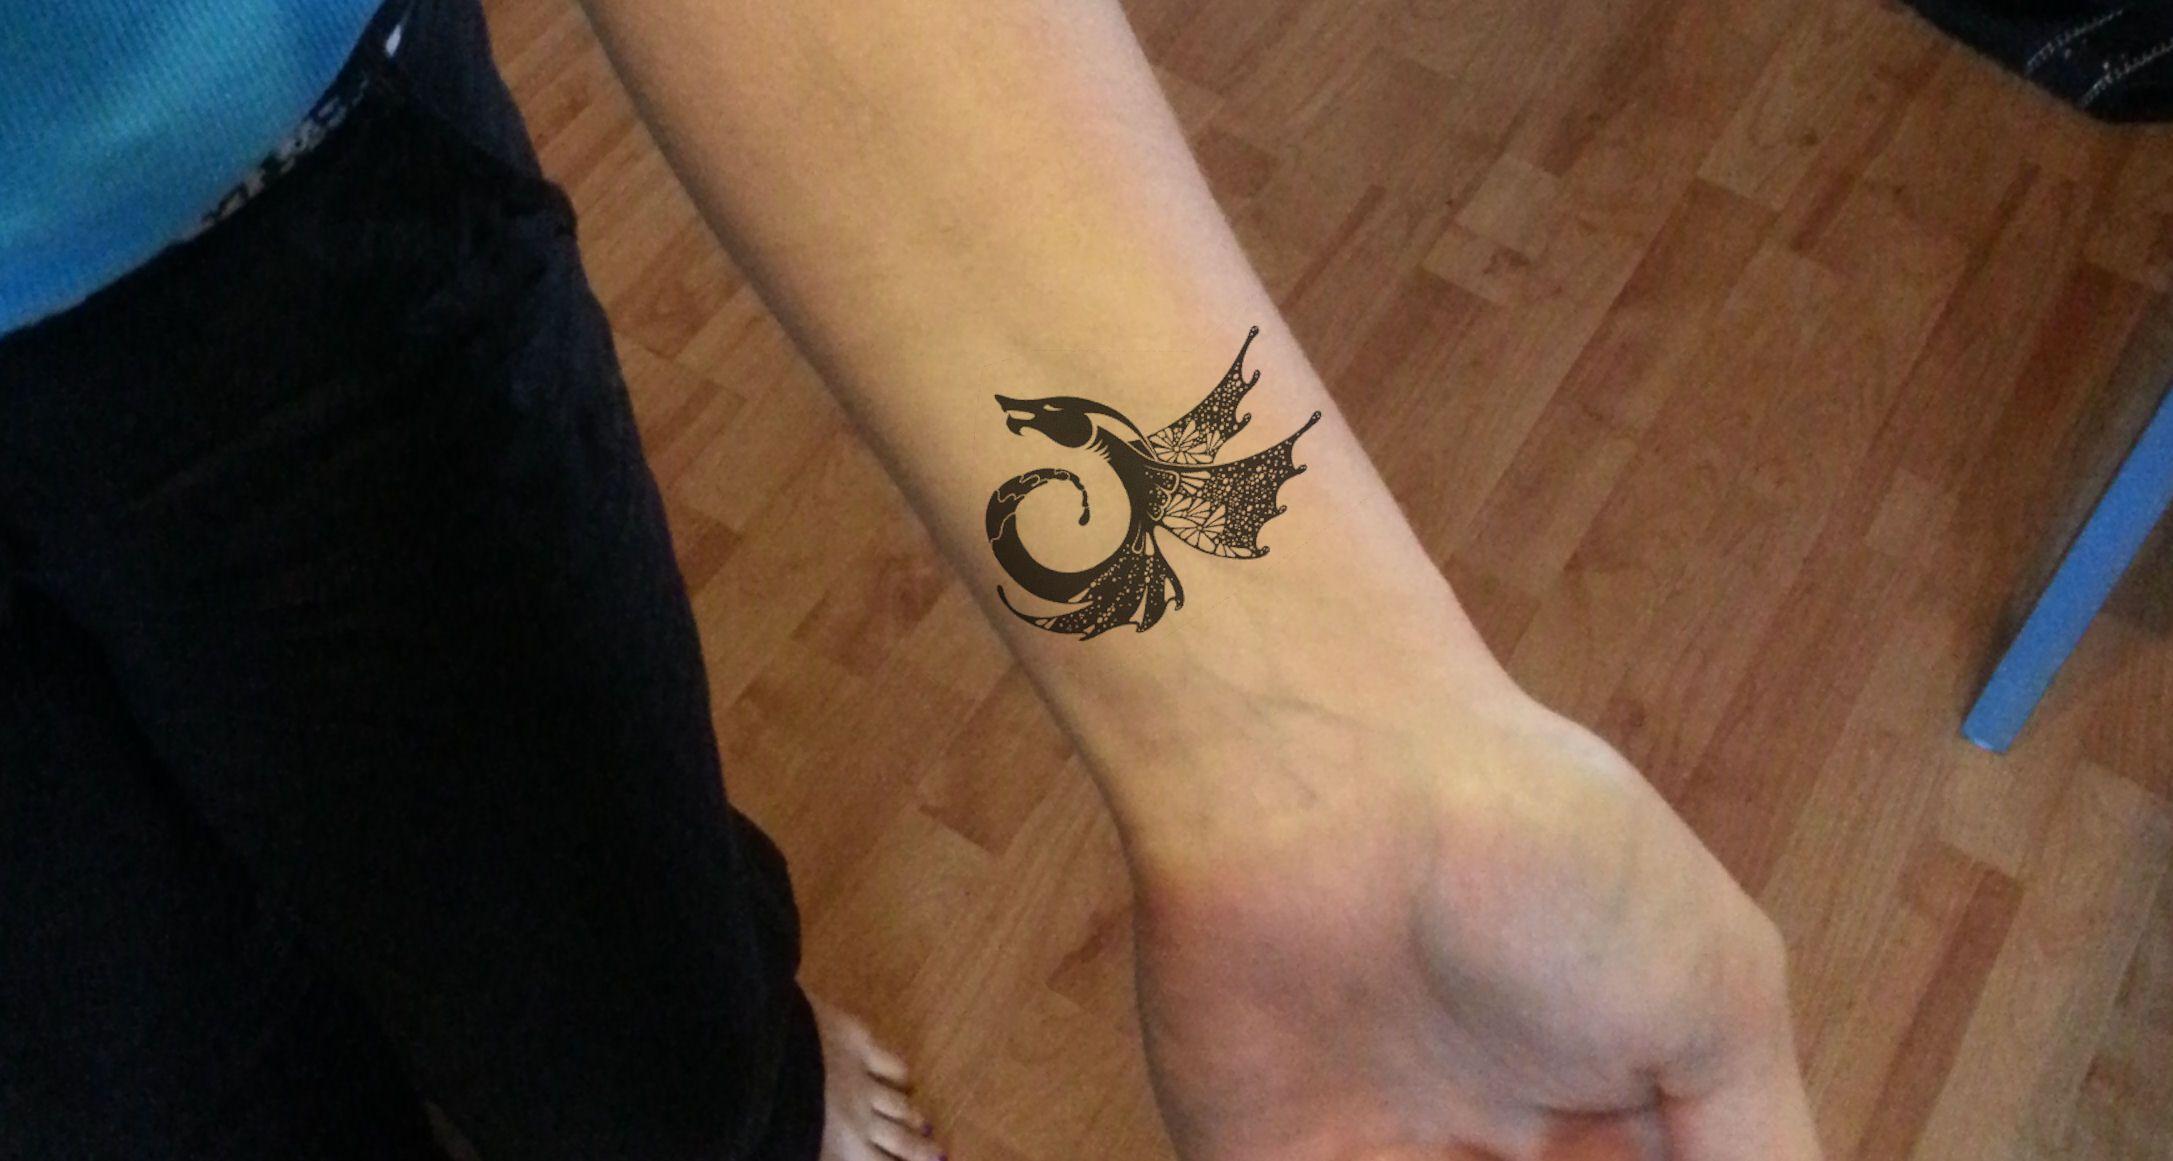 Tribal dragon wrist tattoo idea Do I have this as my